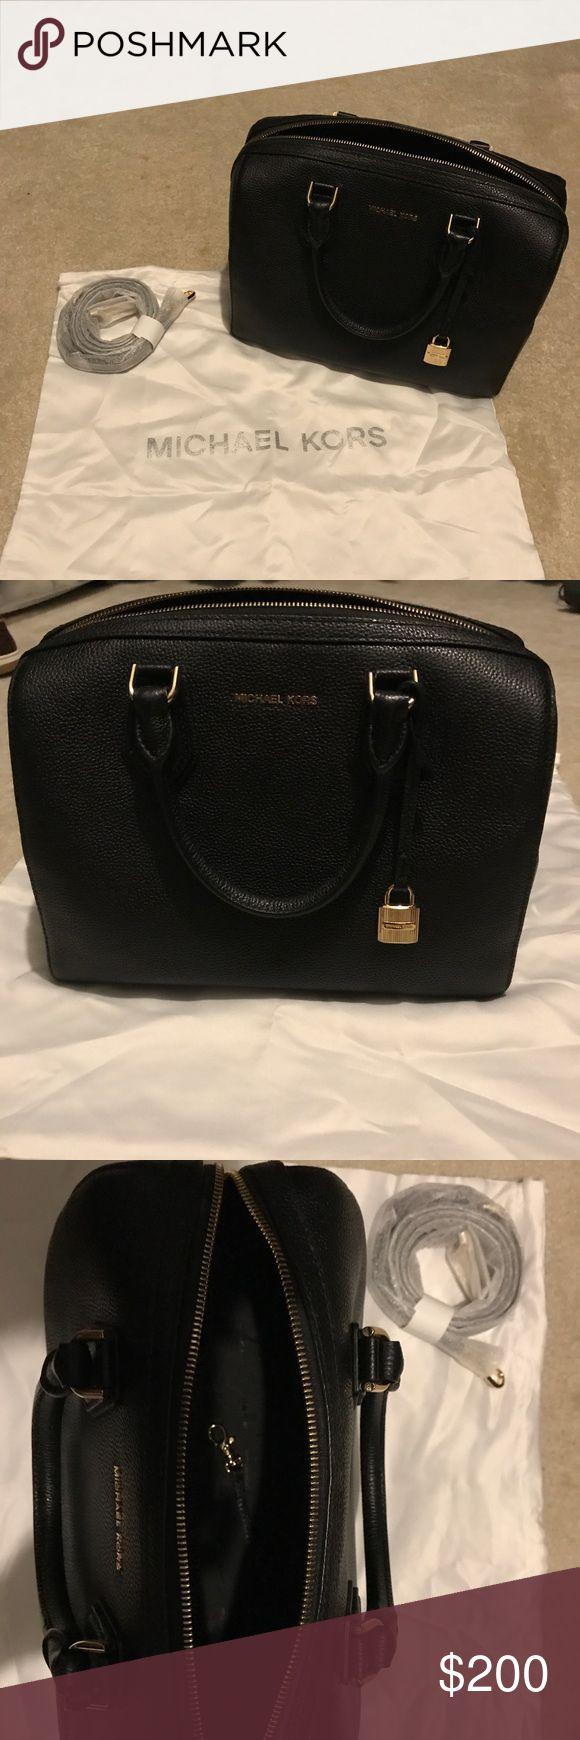 "Michael Kors Purse Michael Kors Mercer Medium Duffel in black leather. Perfect condition! Product Details  11-1/2""W x 8-1/4""H x 6-3/4""D Interior features 1 zip pocket, 4 slip pockets and 1 key finder 4-3/4""L double handles; 20""L-22-1/2""L detachable strap Michael Kors Bags Satchels"